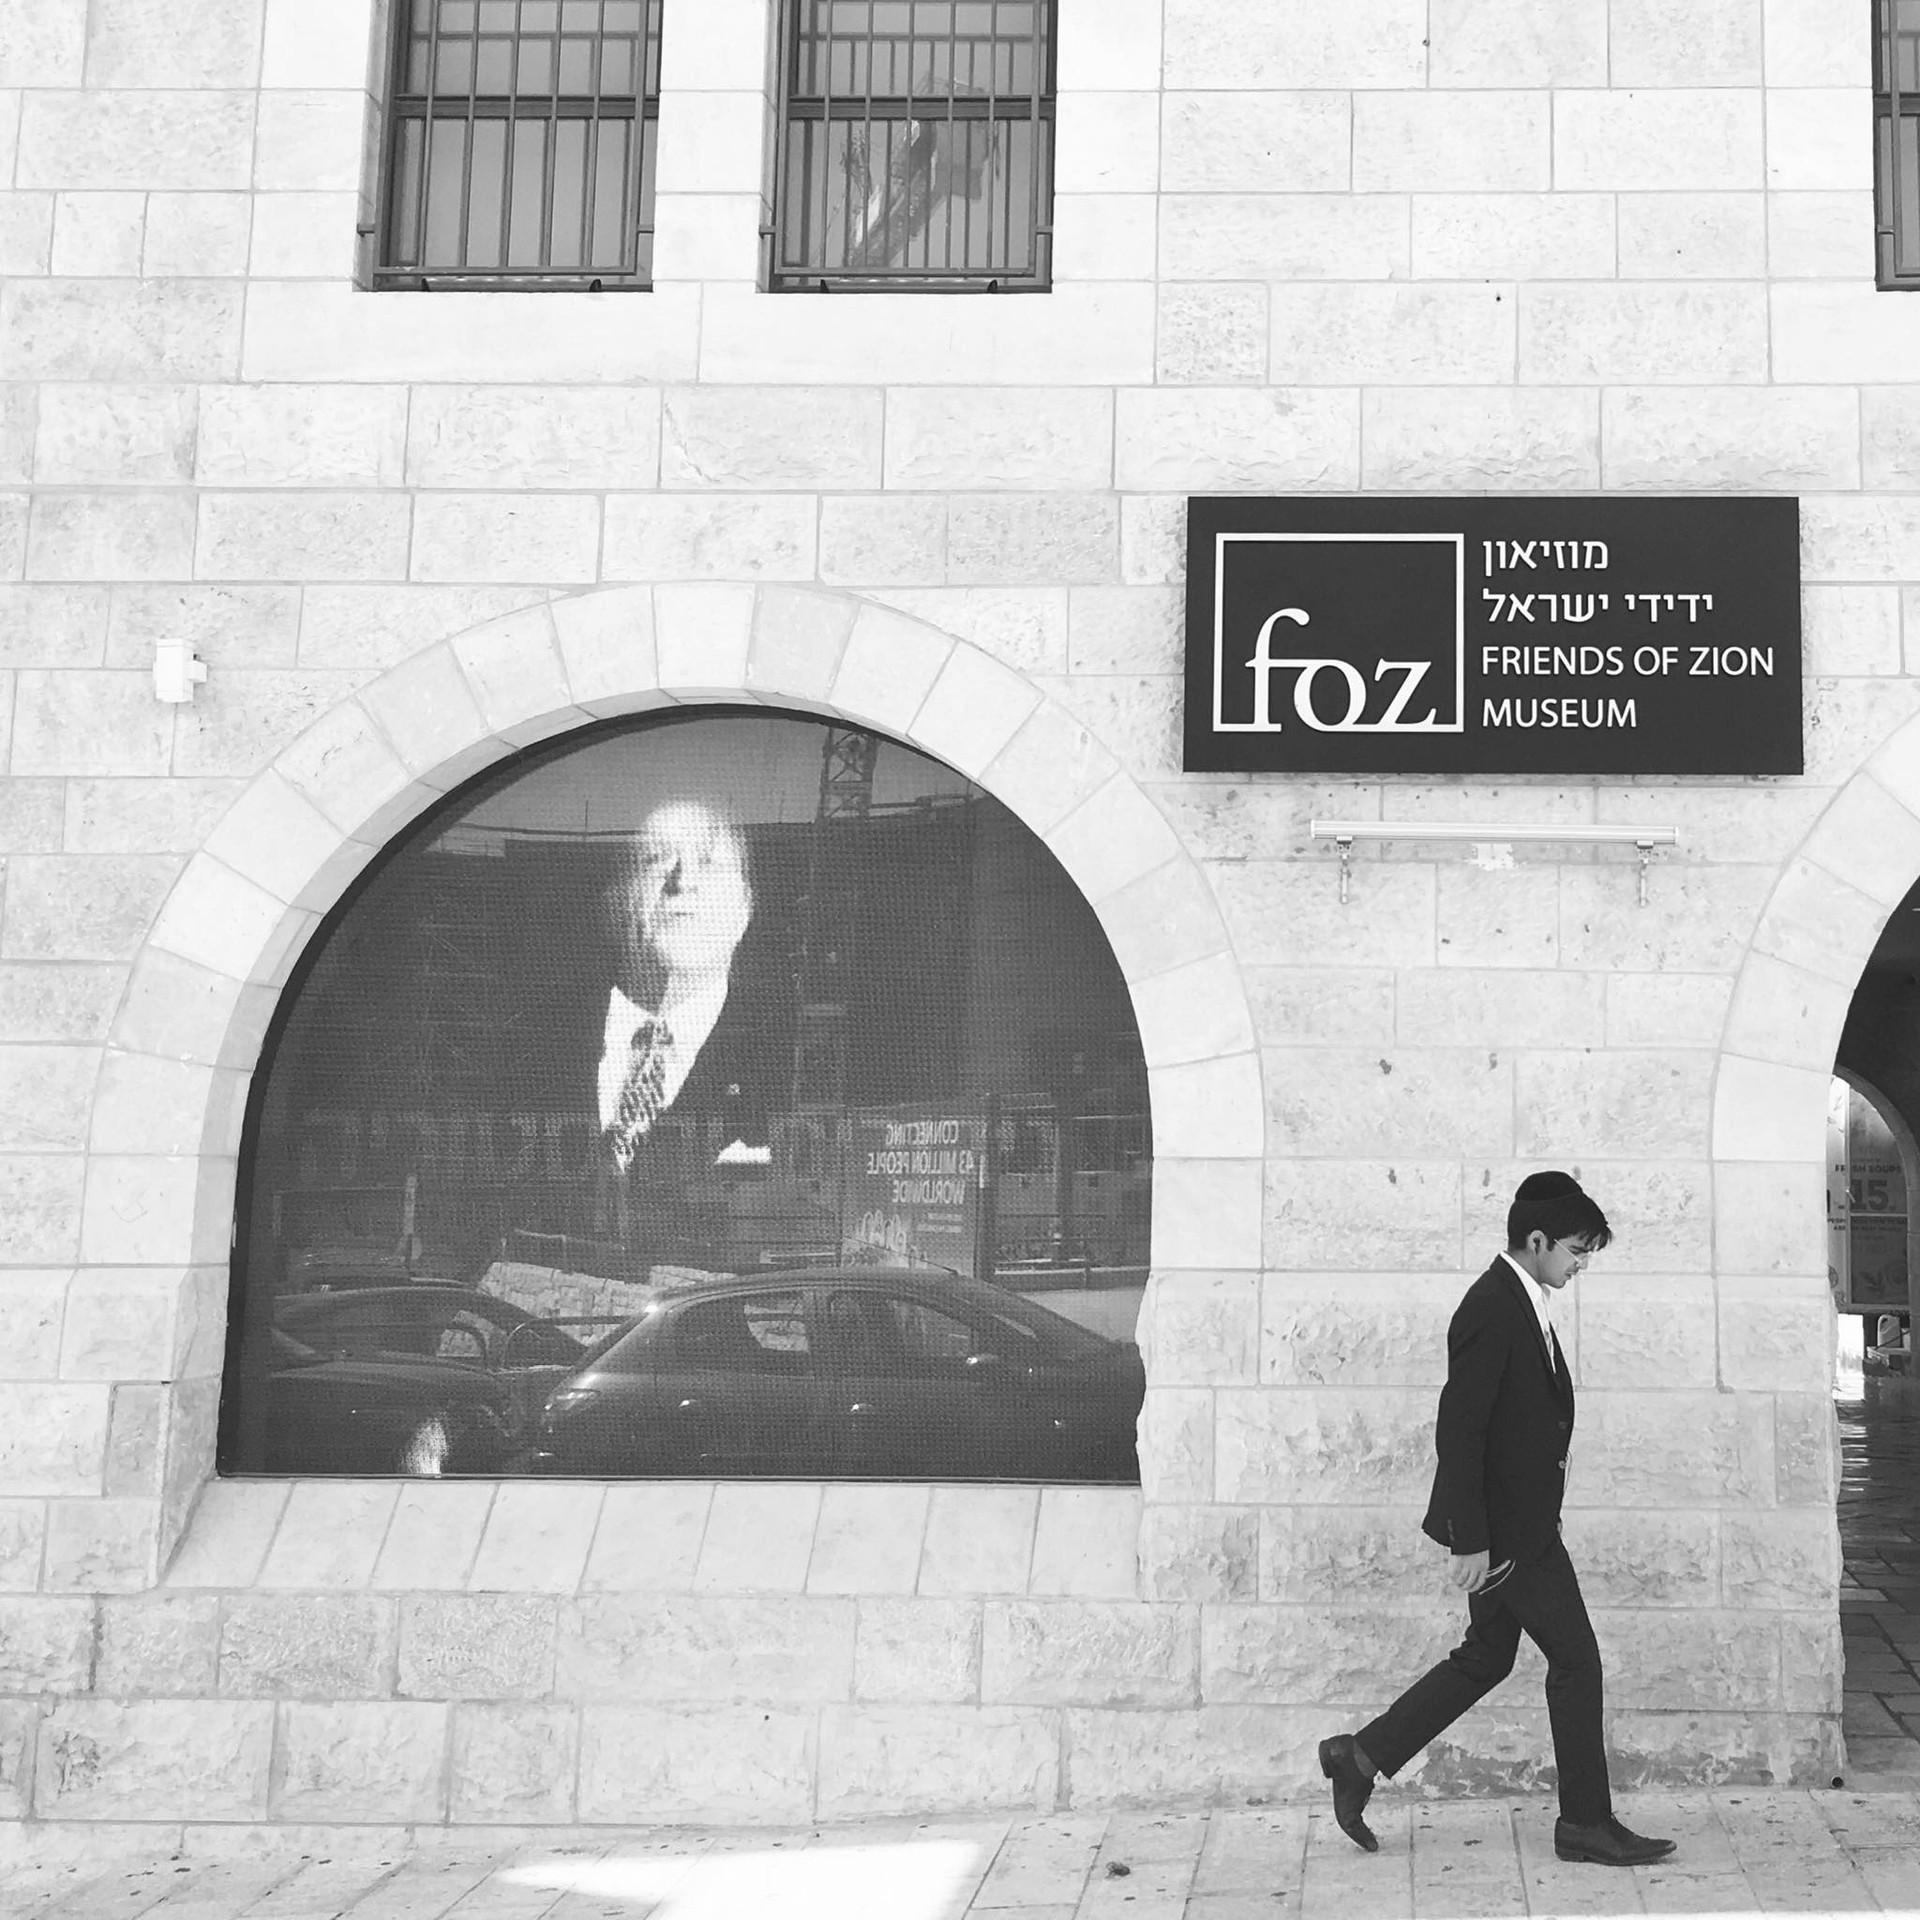 Friends Of Zion